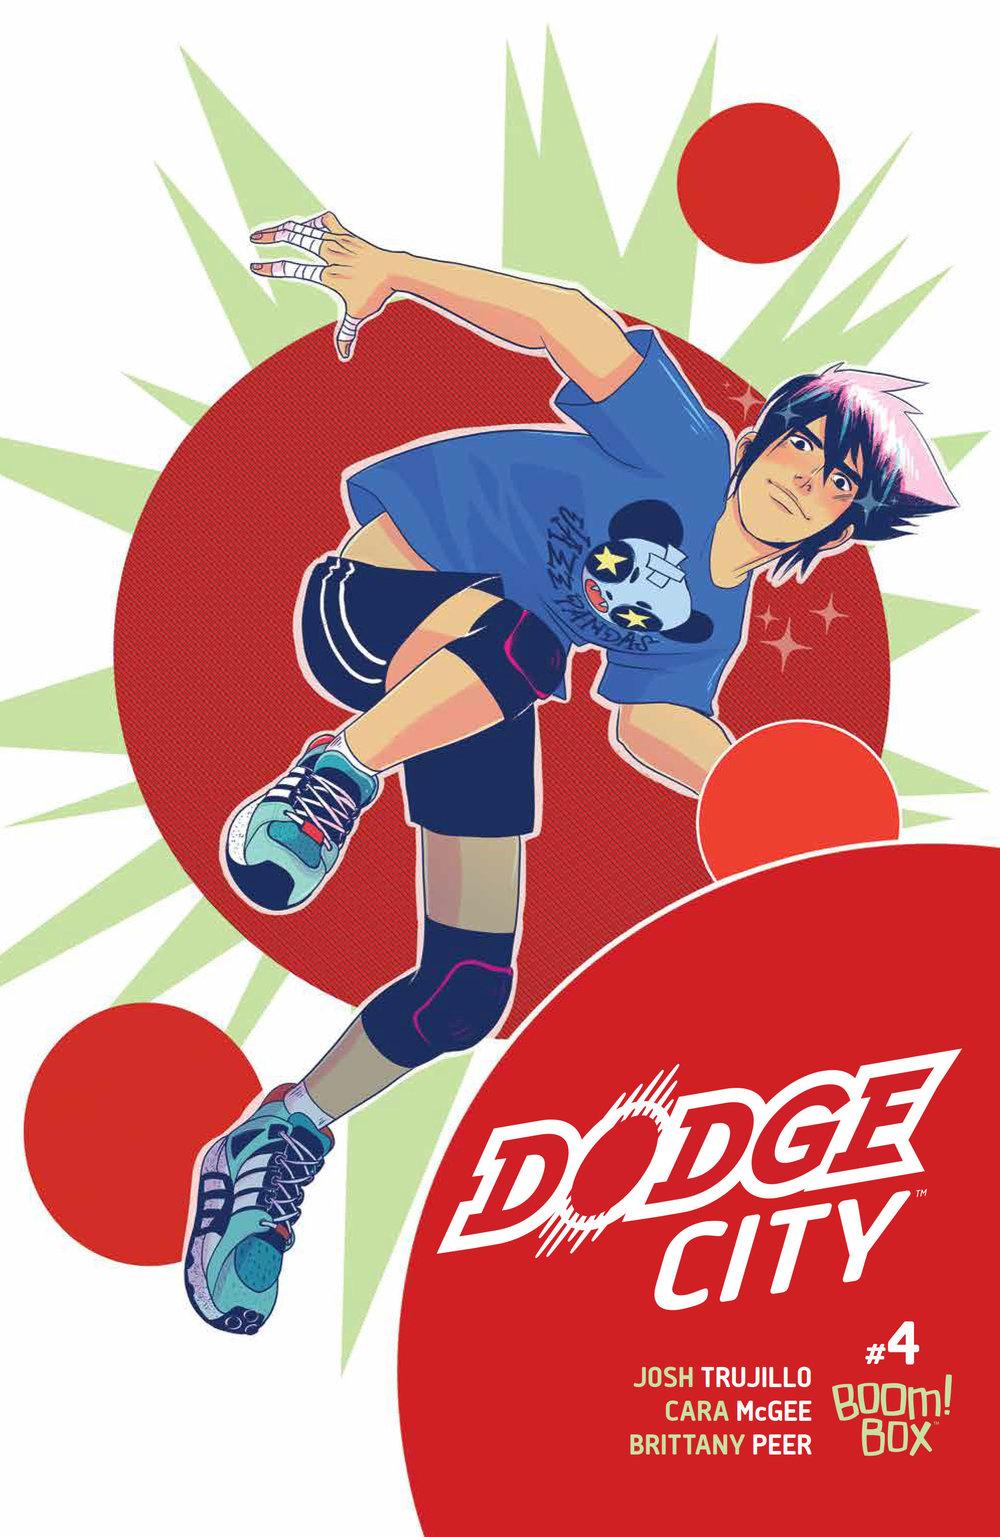 DodgeCity4.jpg